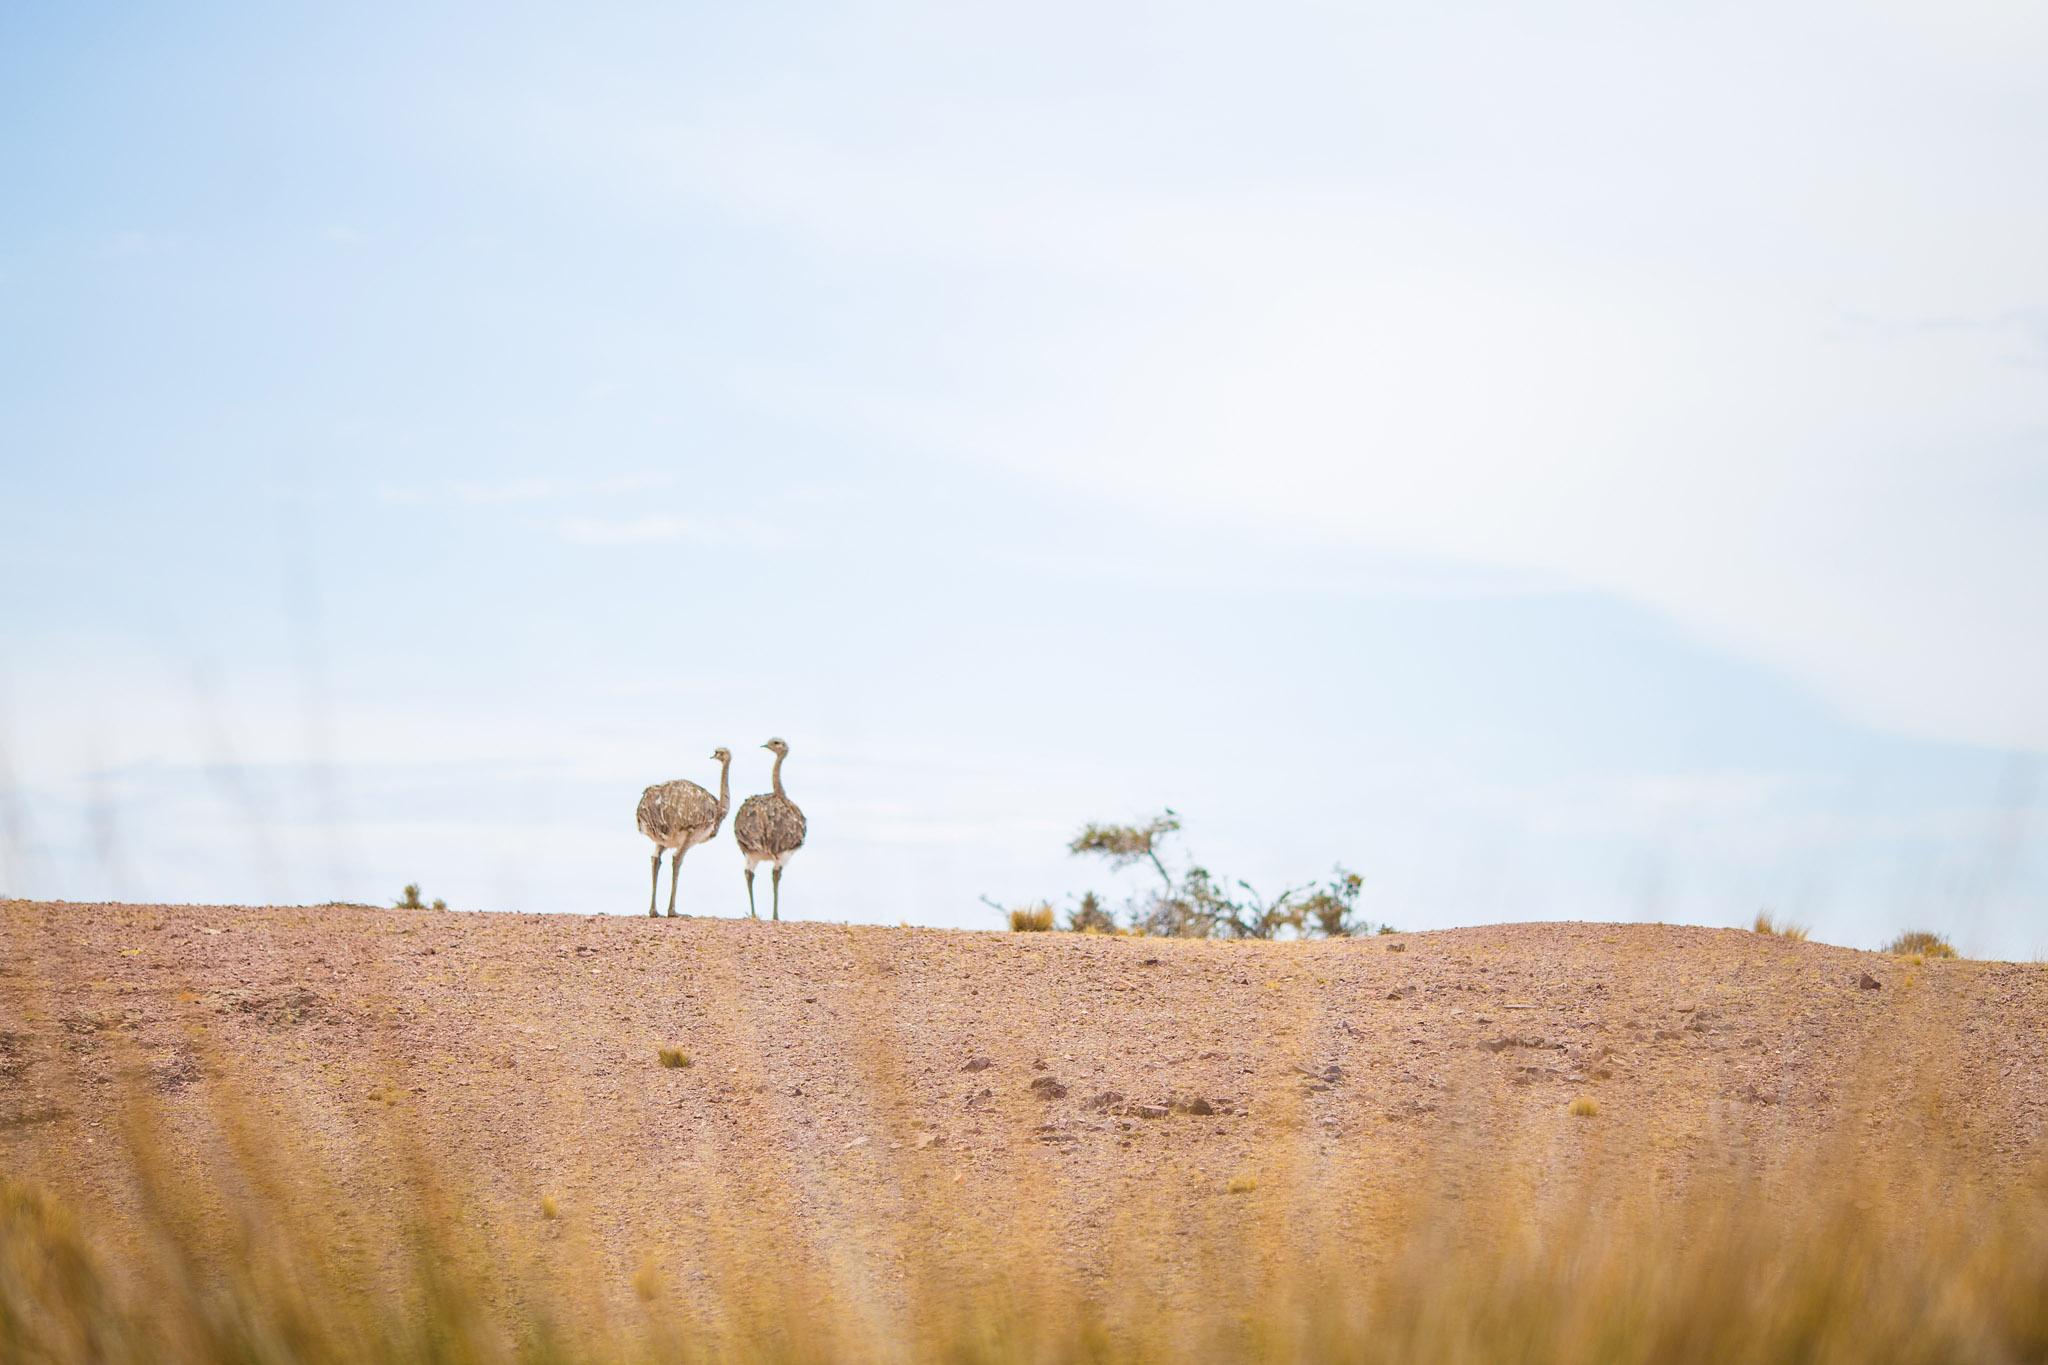 wedding-travellers-argentina-camarones-nandu-rhea